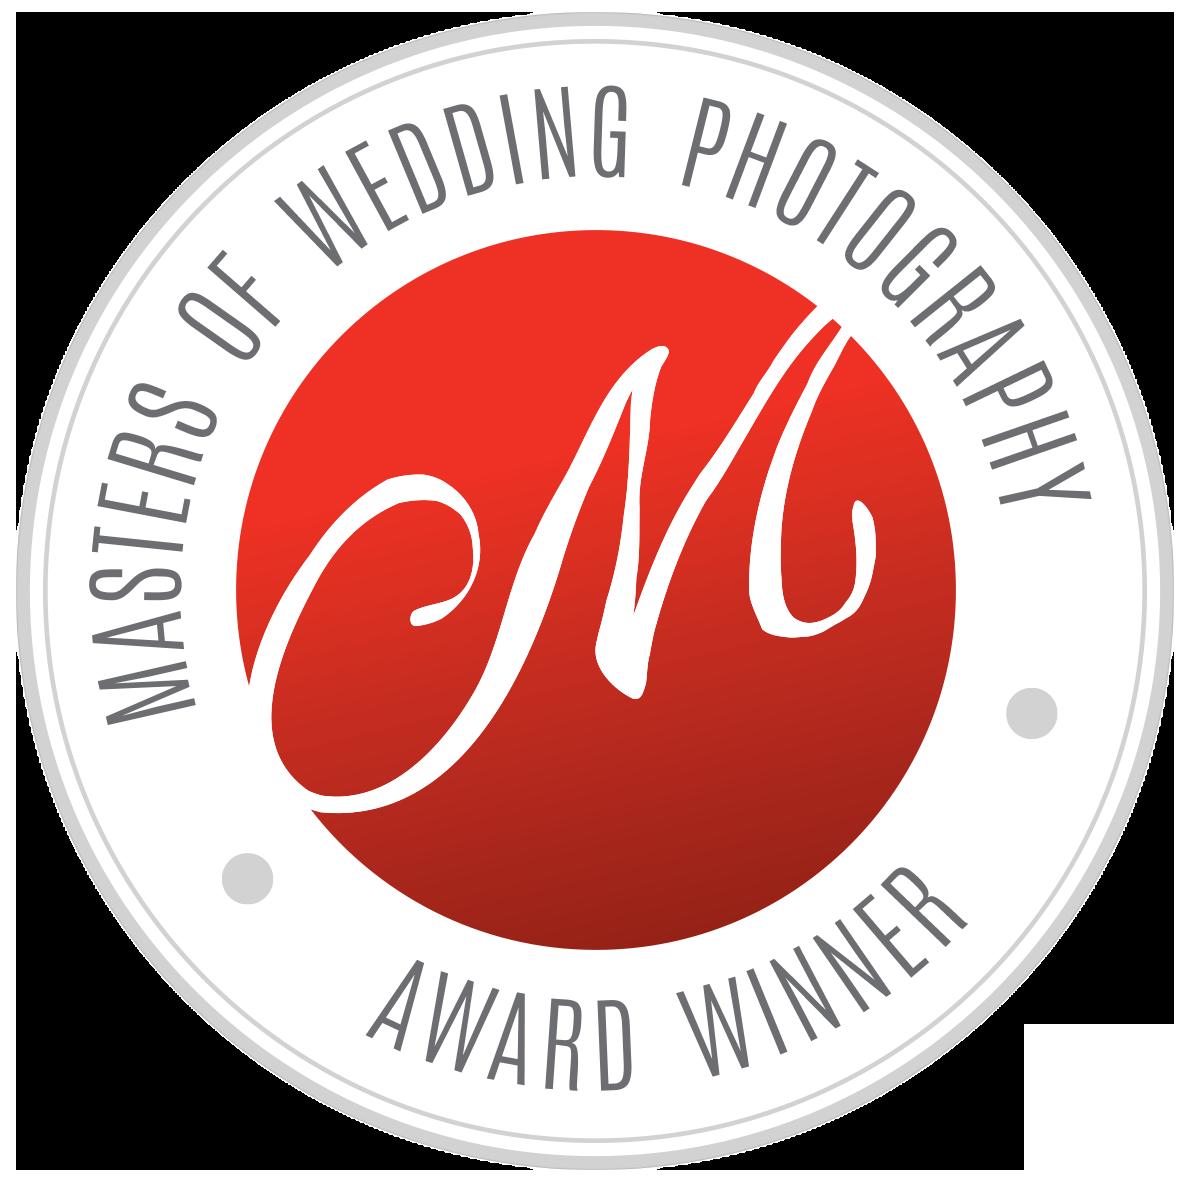 Masters of wedding photography award badge